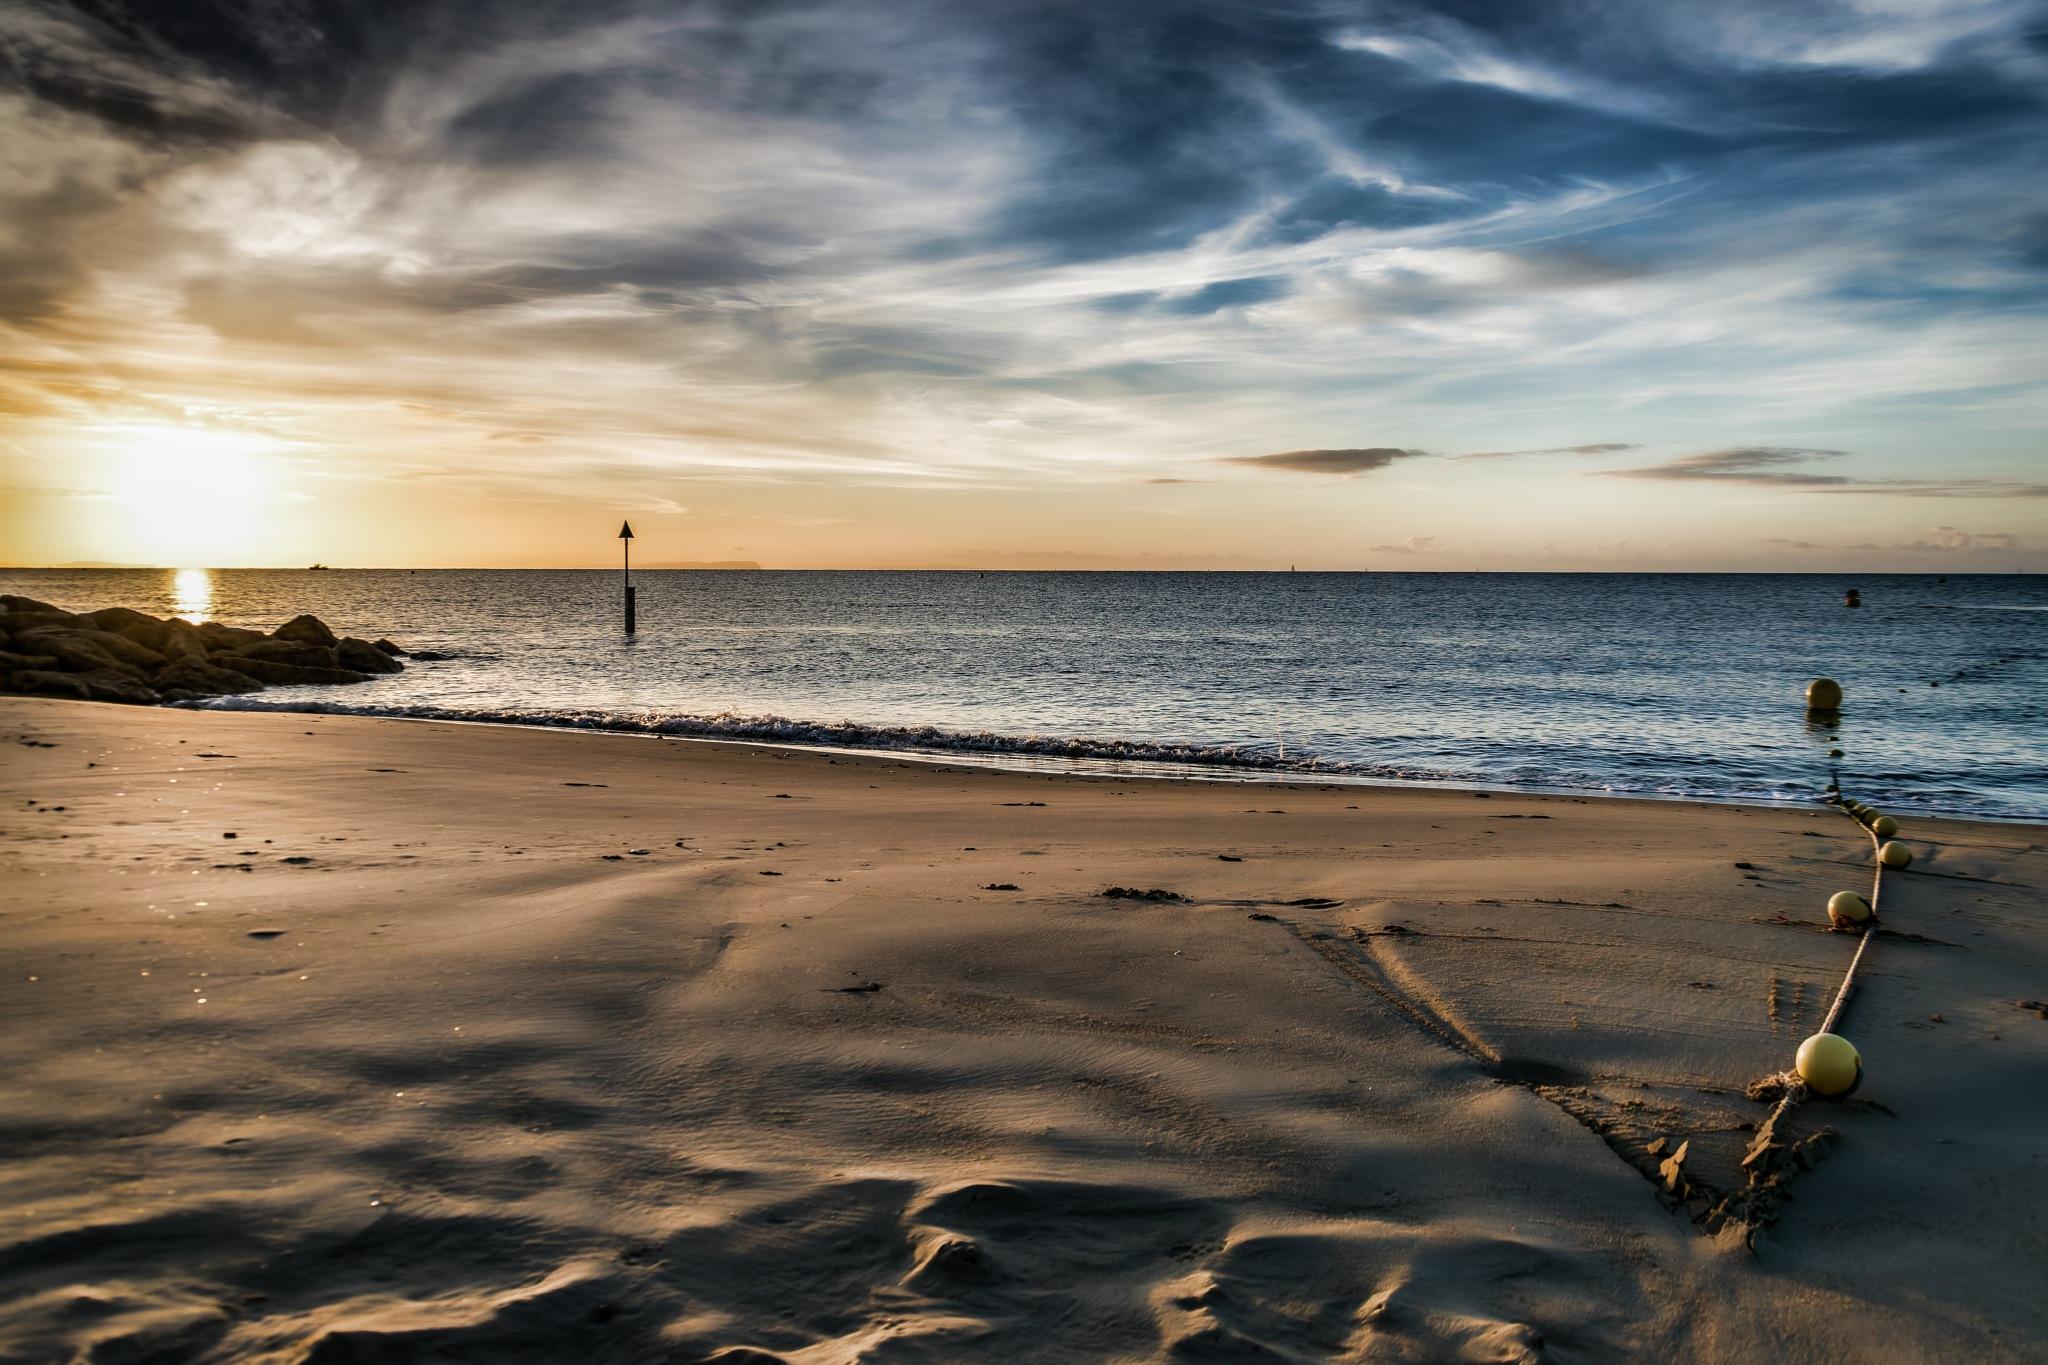 Early Morning Sandbanks by Gary Capstick